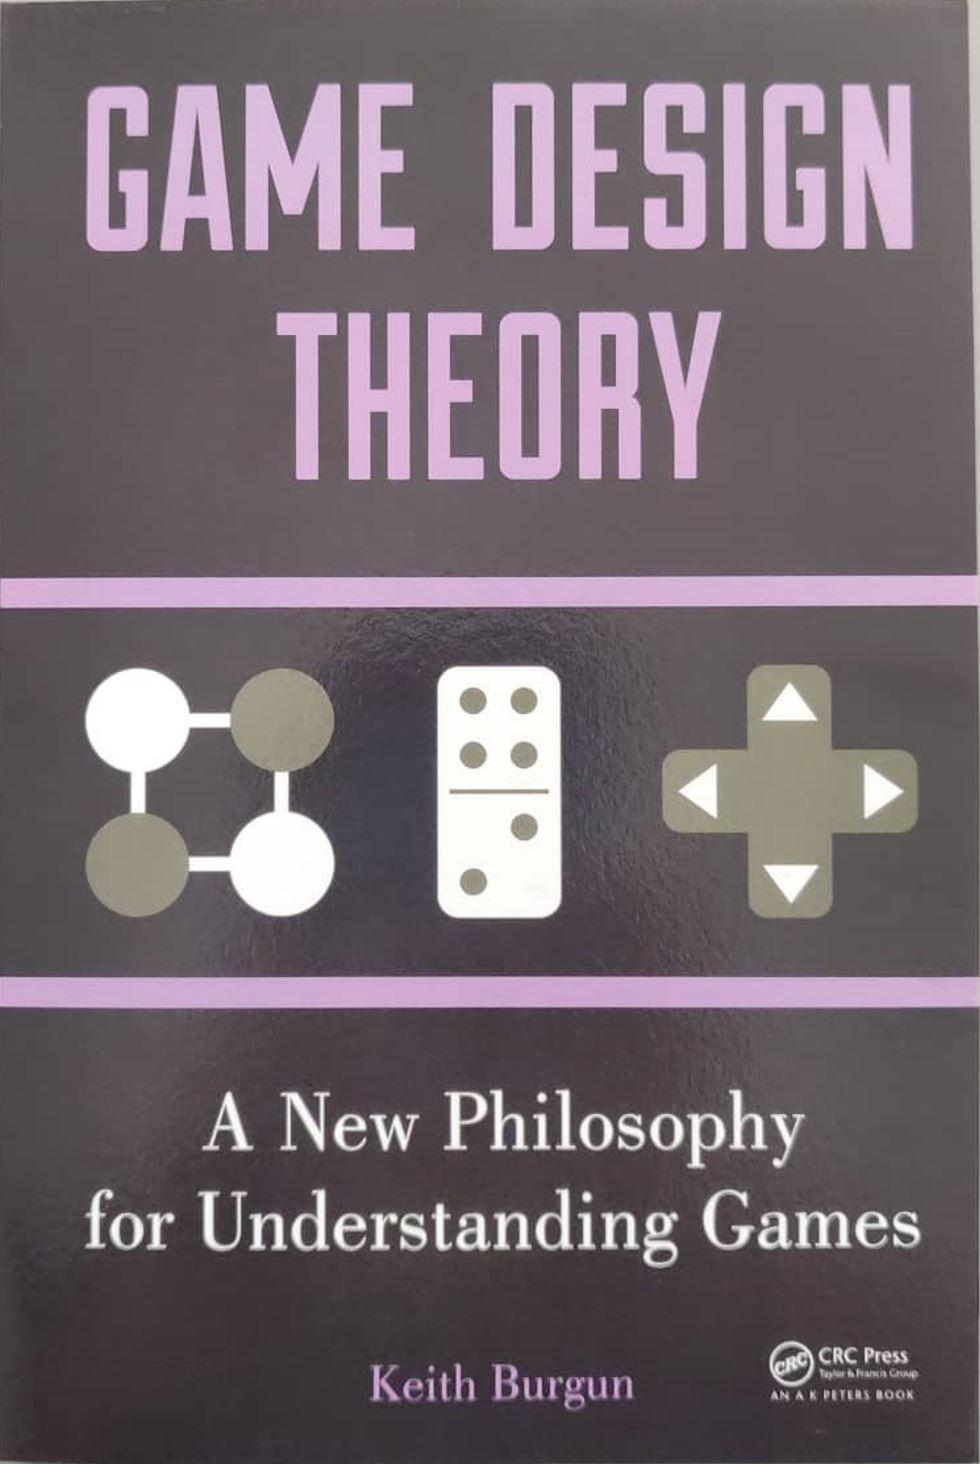 Game Design Theory: A New Philosophy for Understanding Games de Keith Burgun